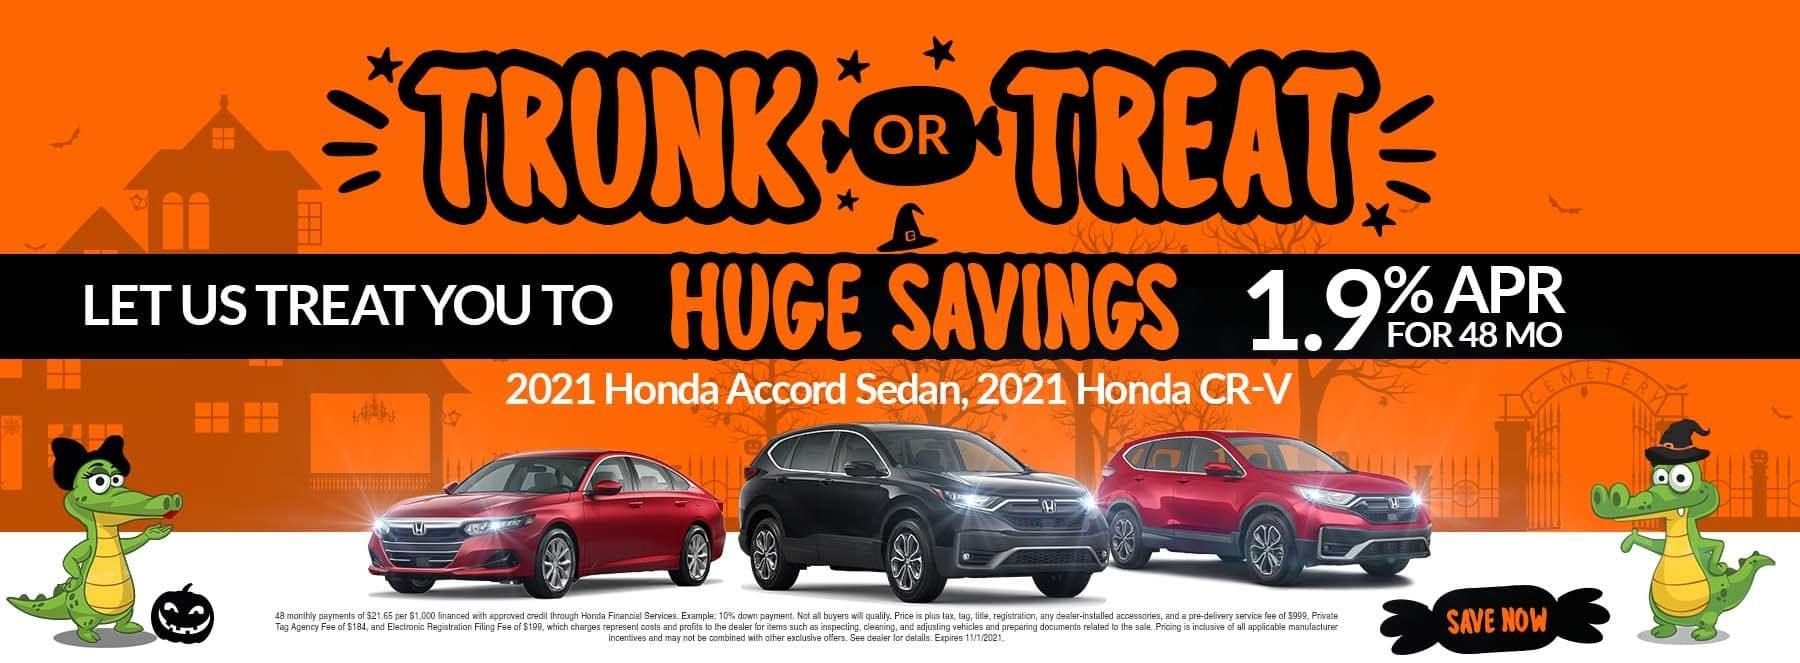 Trunk Or Treat | Let Us Treat You To Huge Savings | 2021 Honda CR-V, 2021 Honda Accord Sedan | 1.9% APR For 48 Months